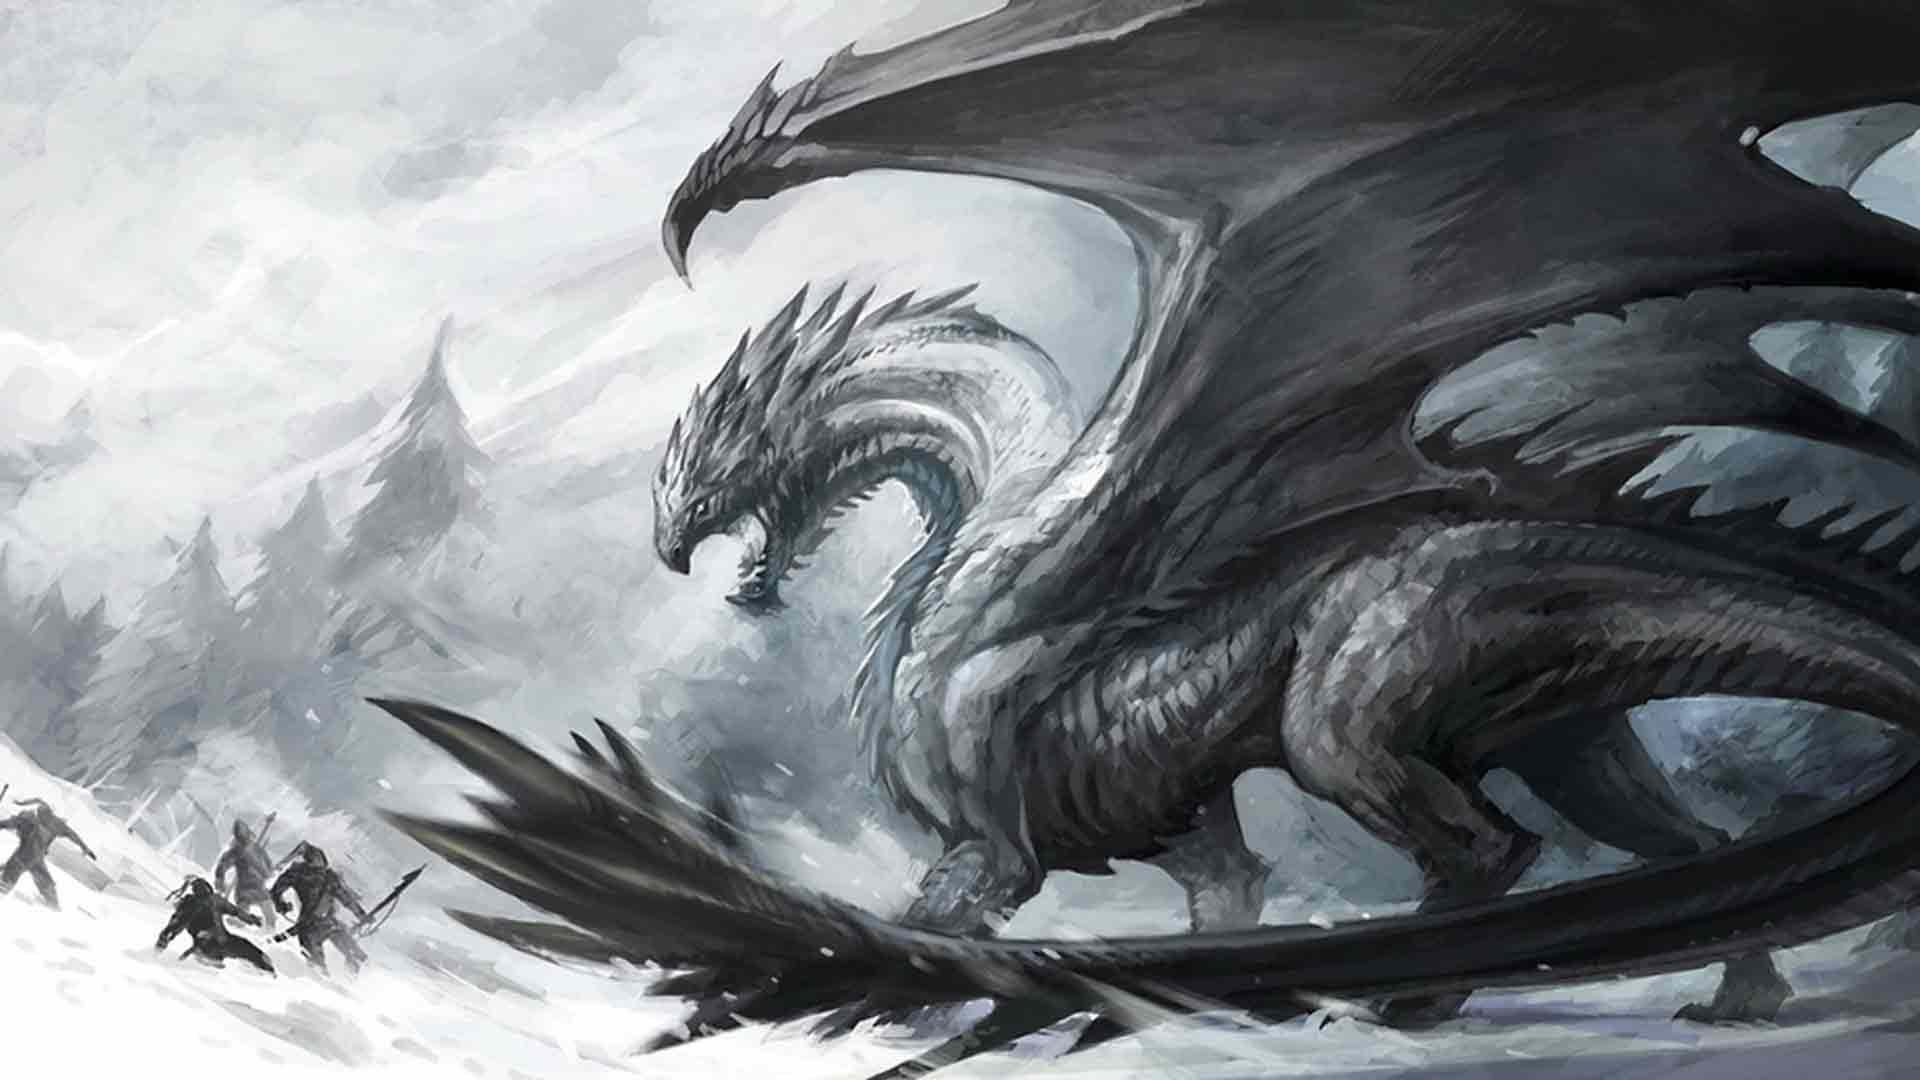 Demon dragon fantasy wallpaper